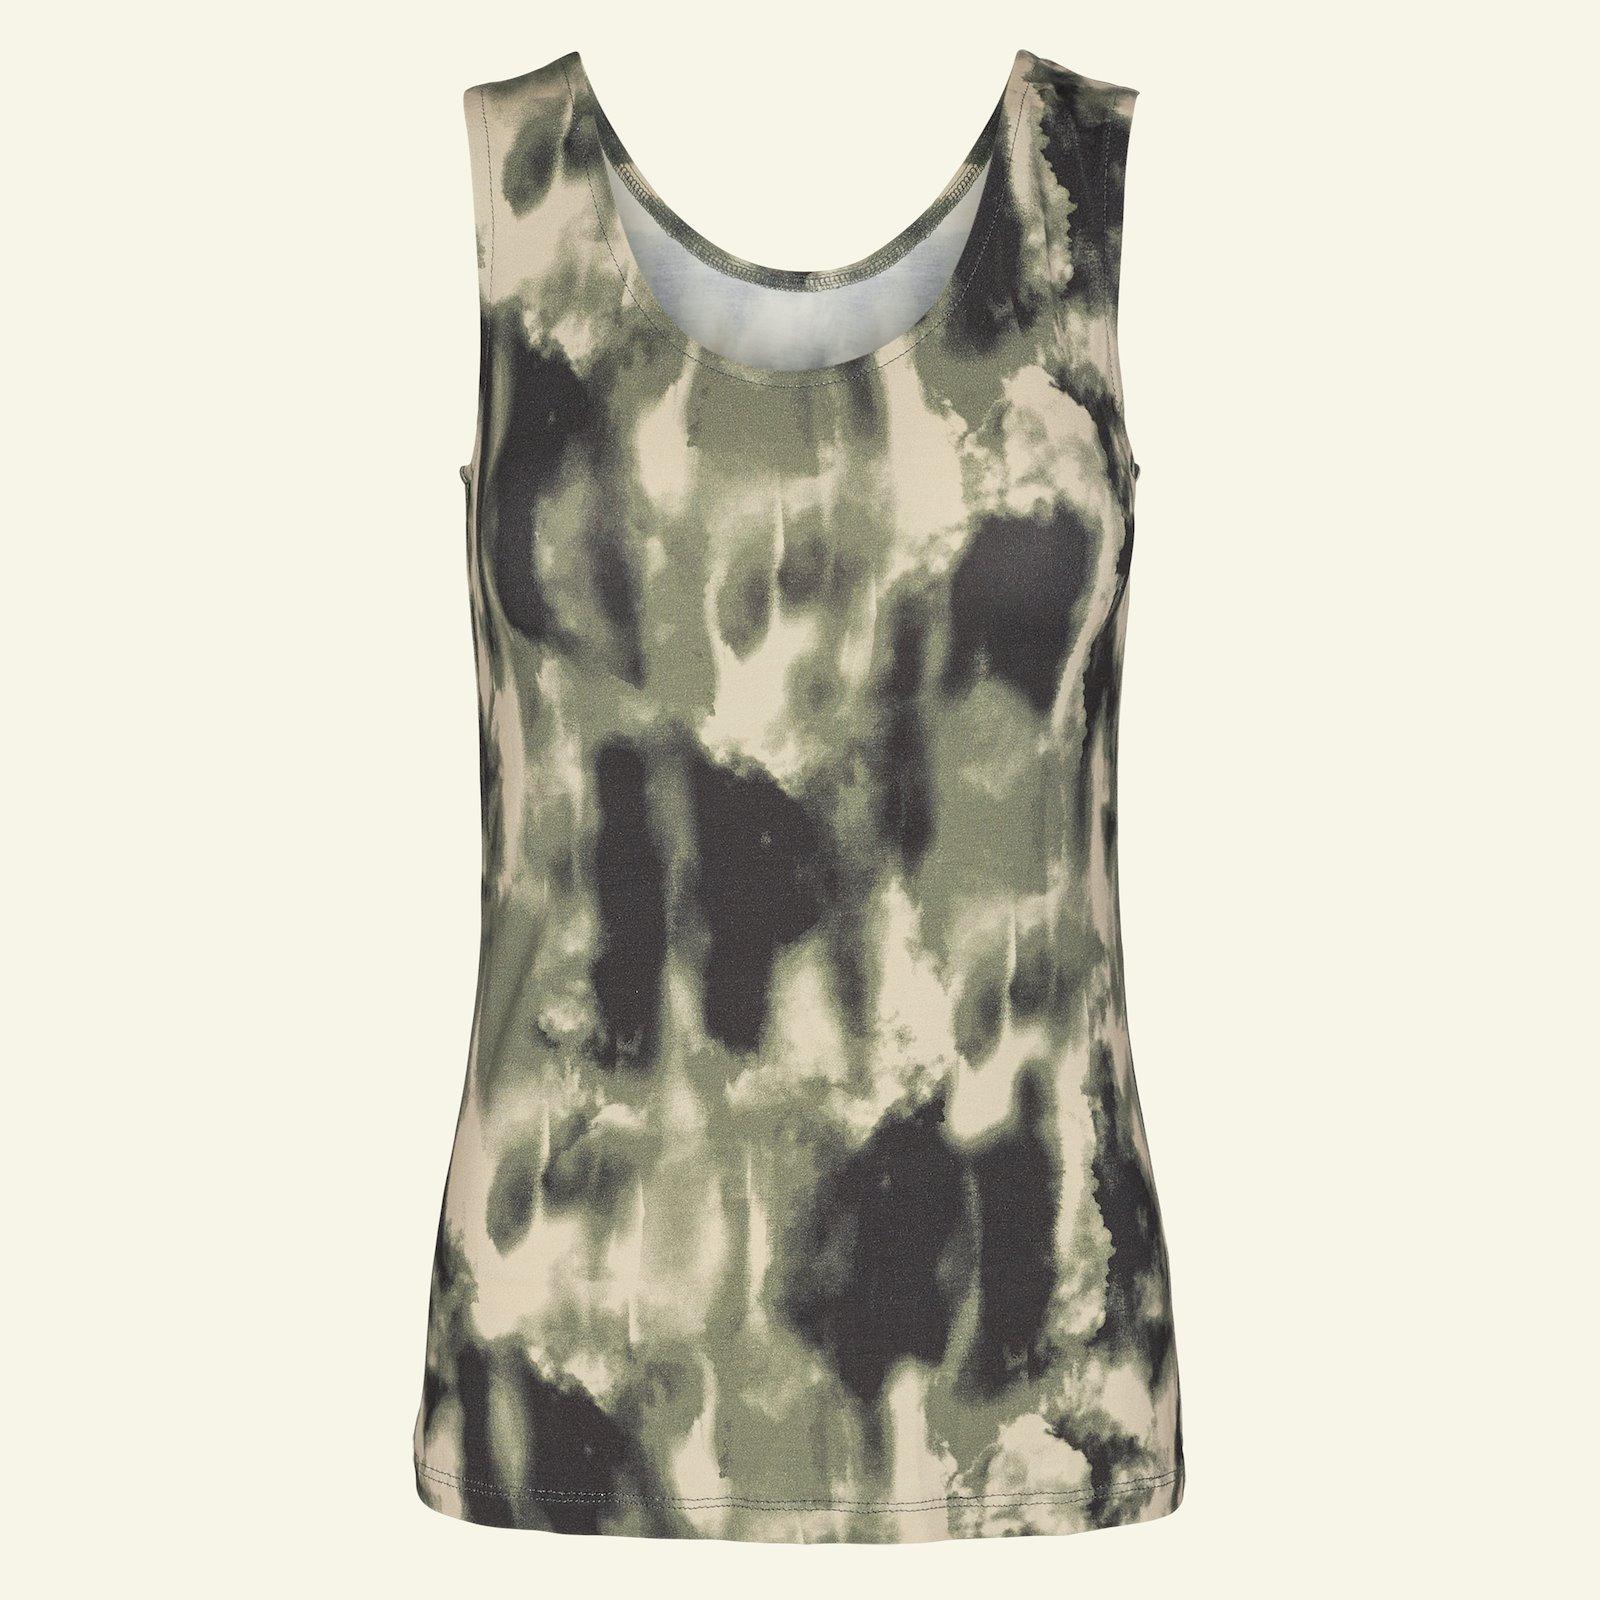 Top and dress, 38/10 p22071_272691_sskit